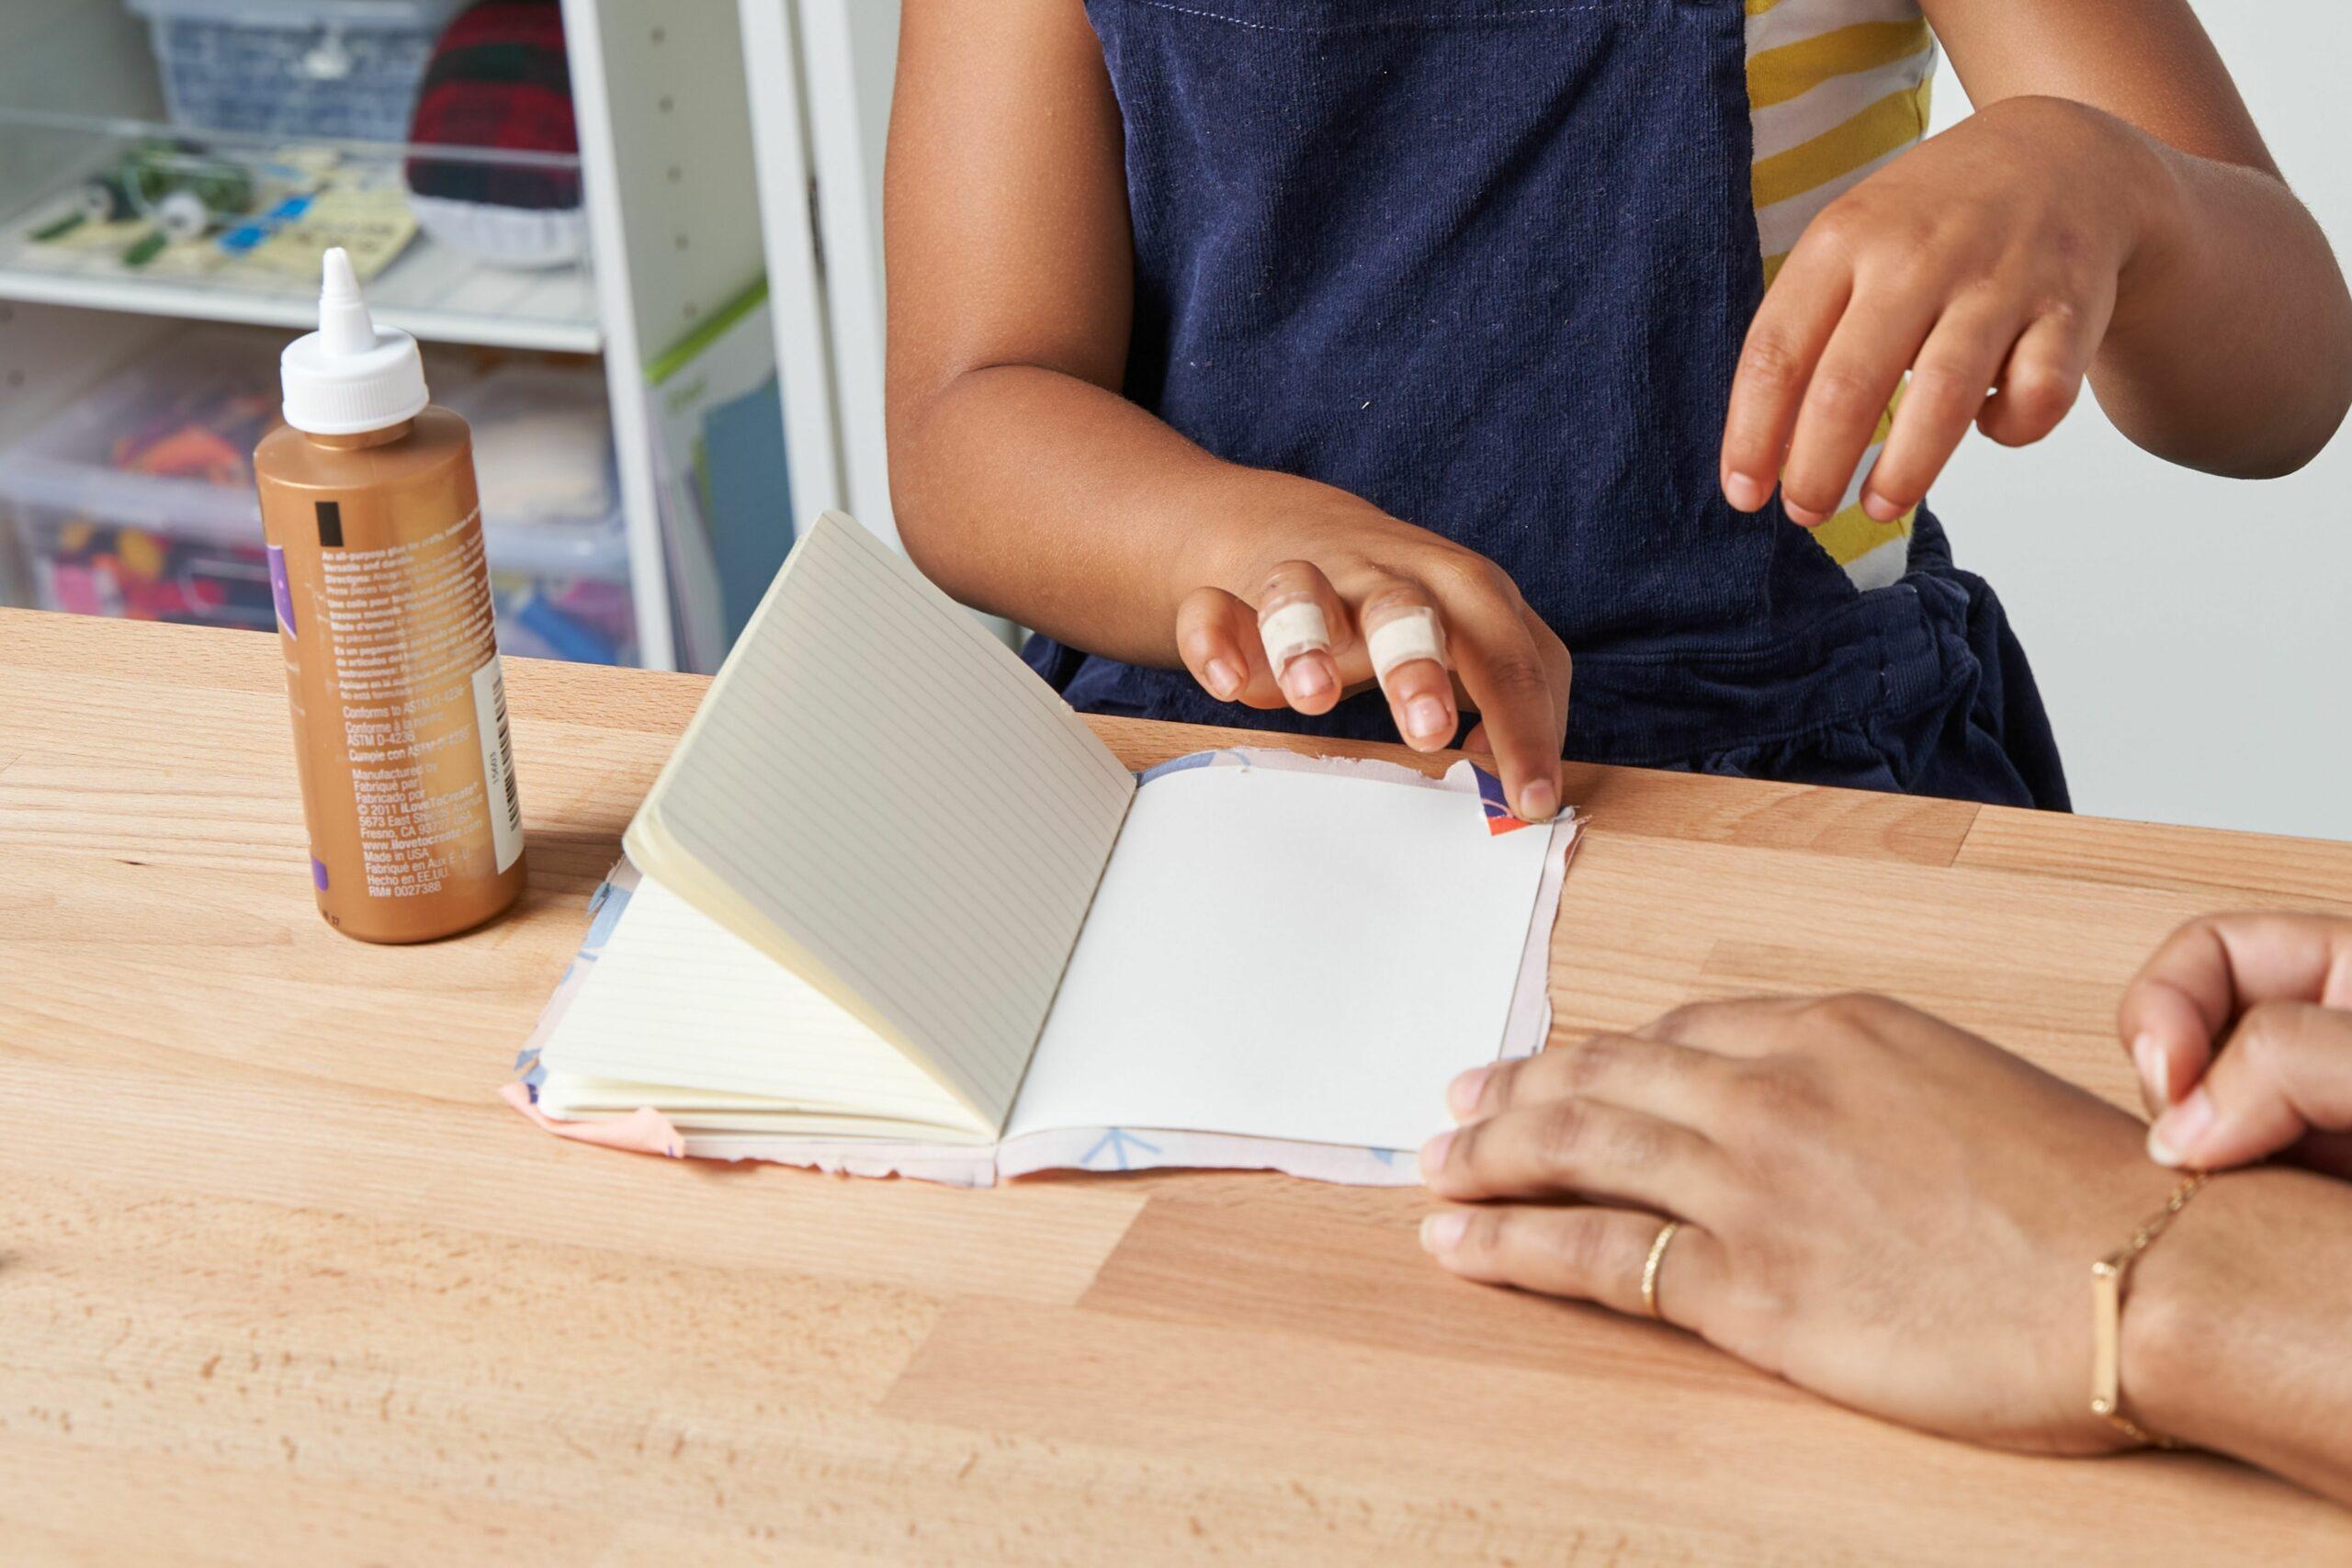 Folding the pre-glued corners down